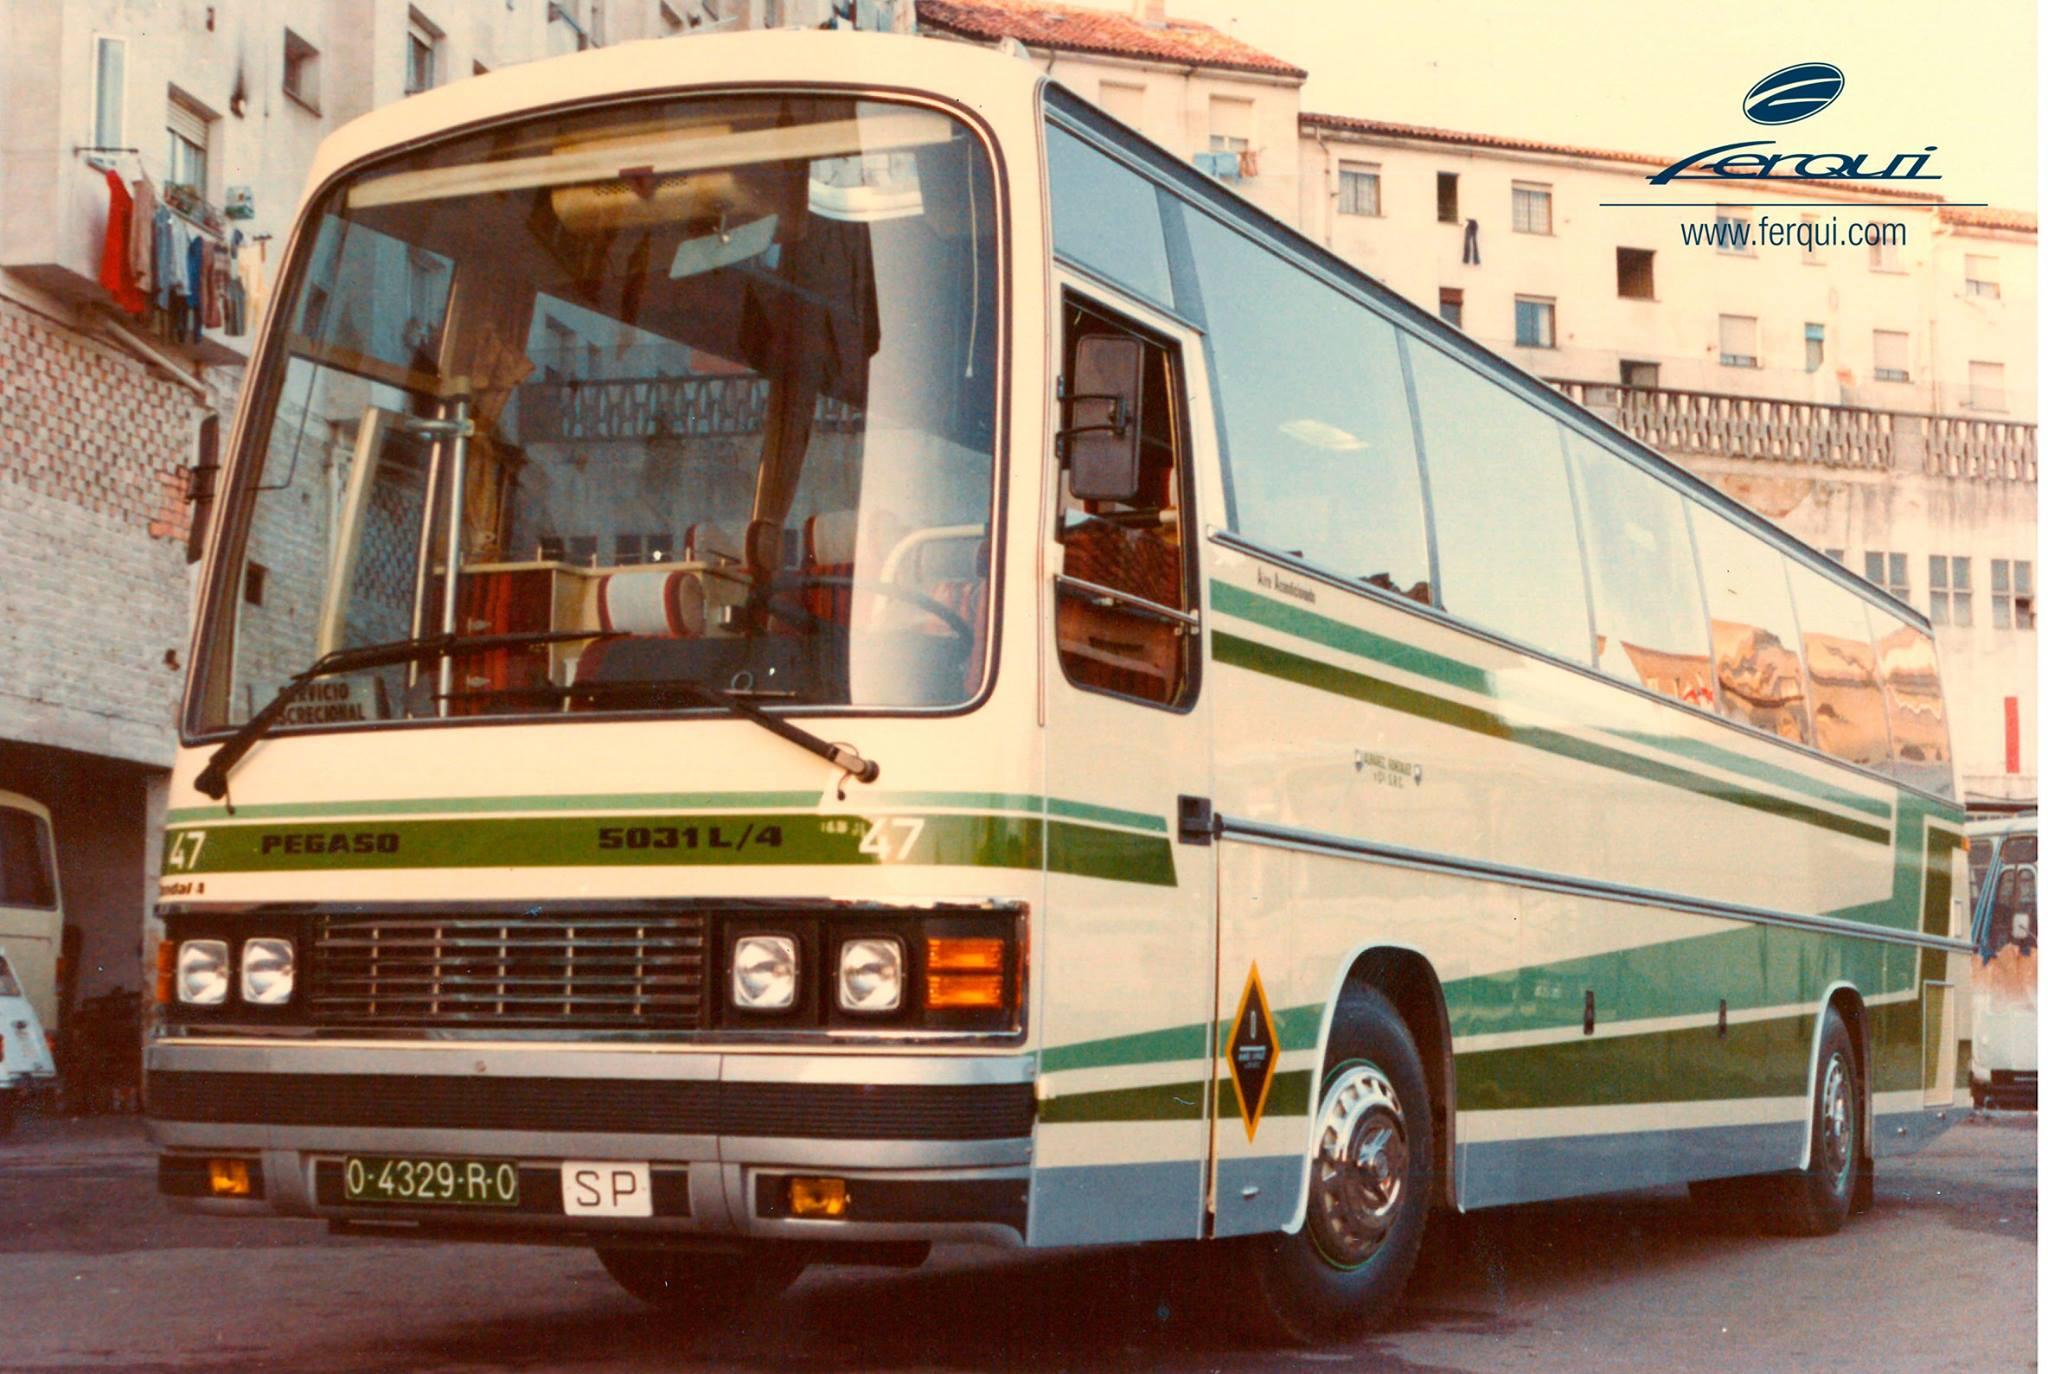 Pegaso-5031-4-motor-achterin-1983